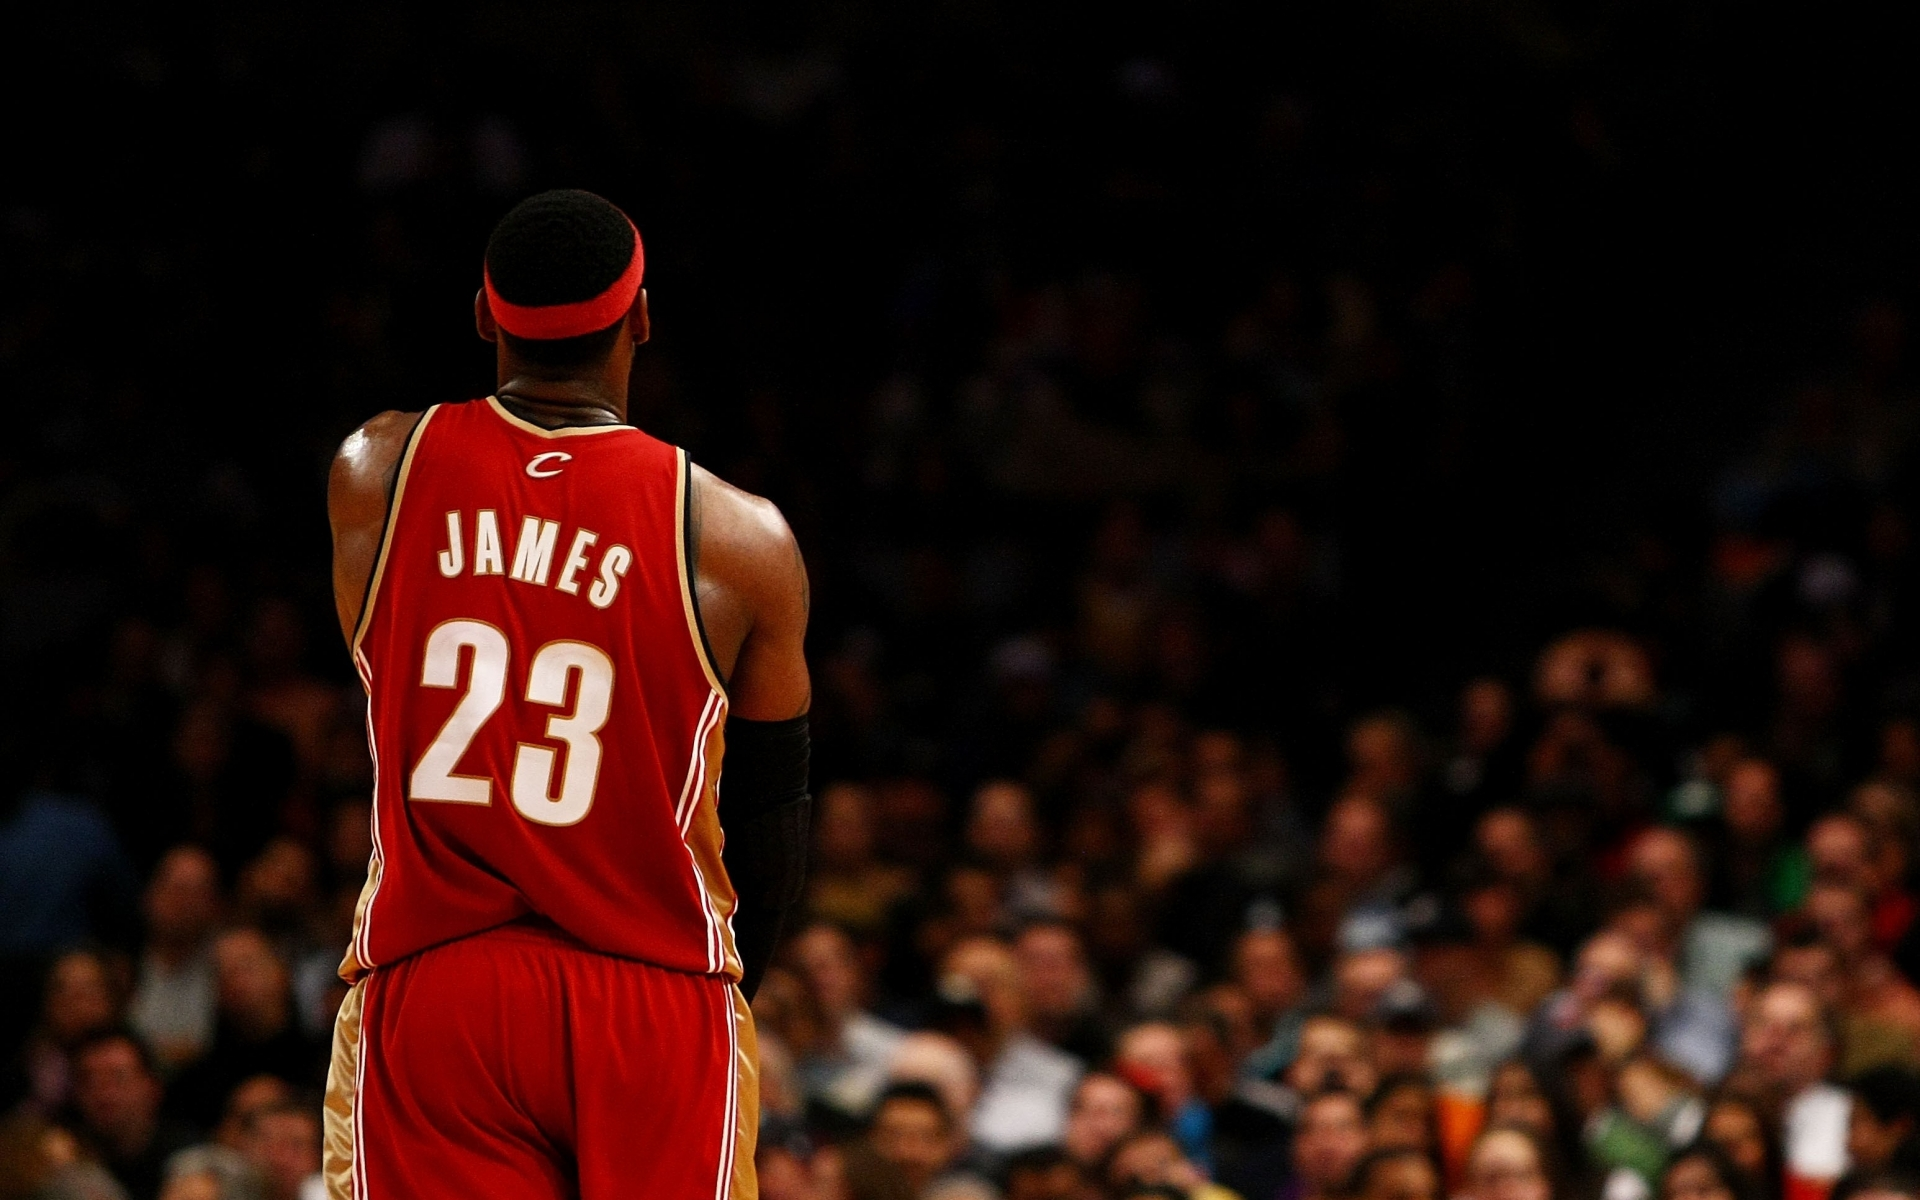 nba basketball lebron james cleveland cavaliers q wallpaper background